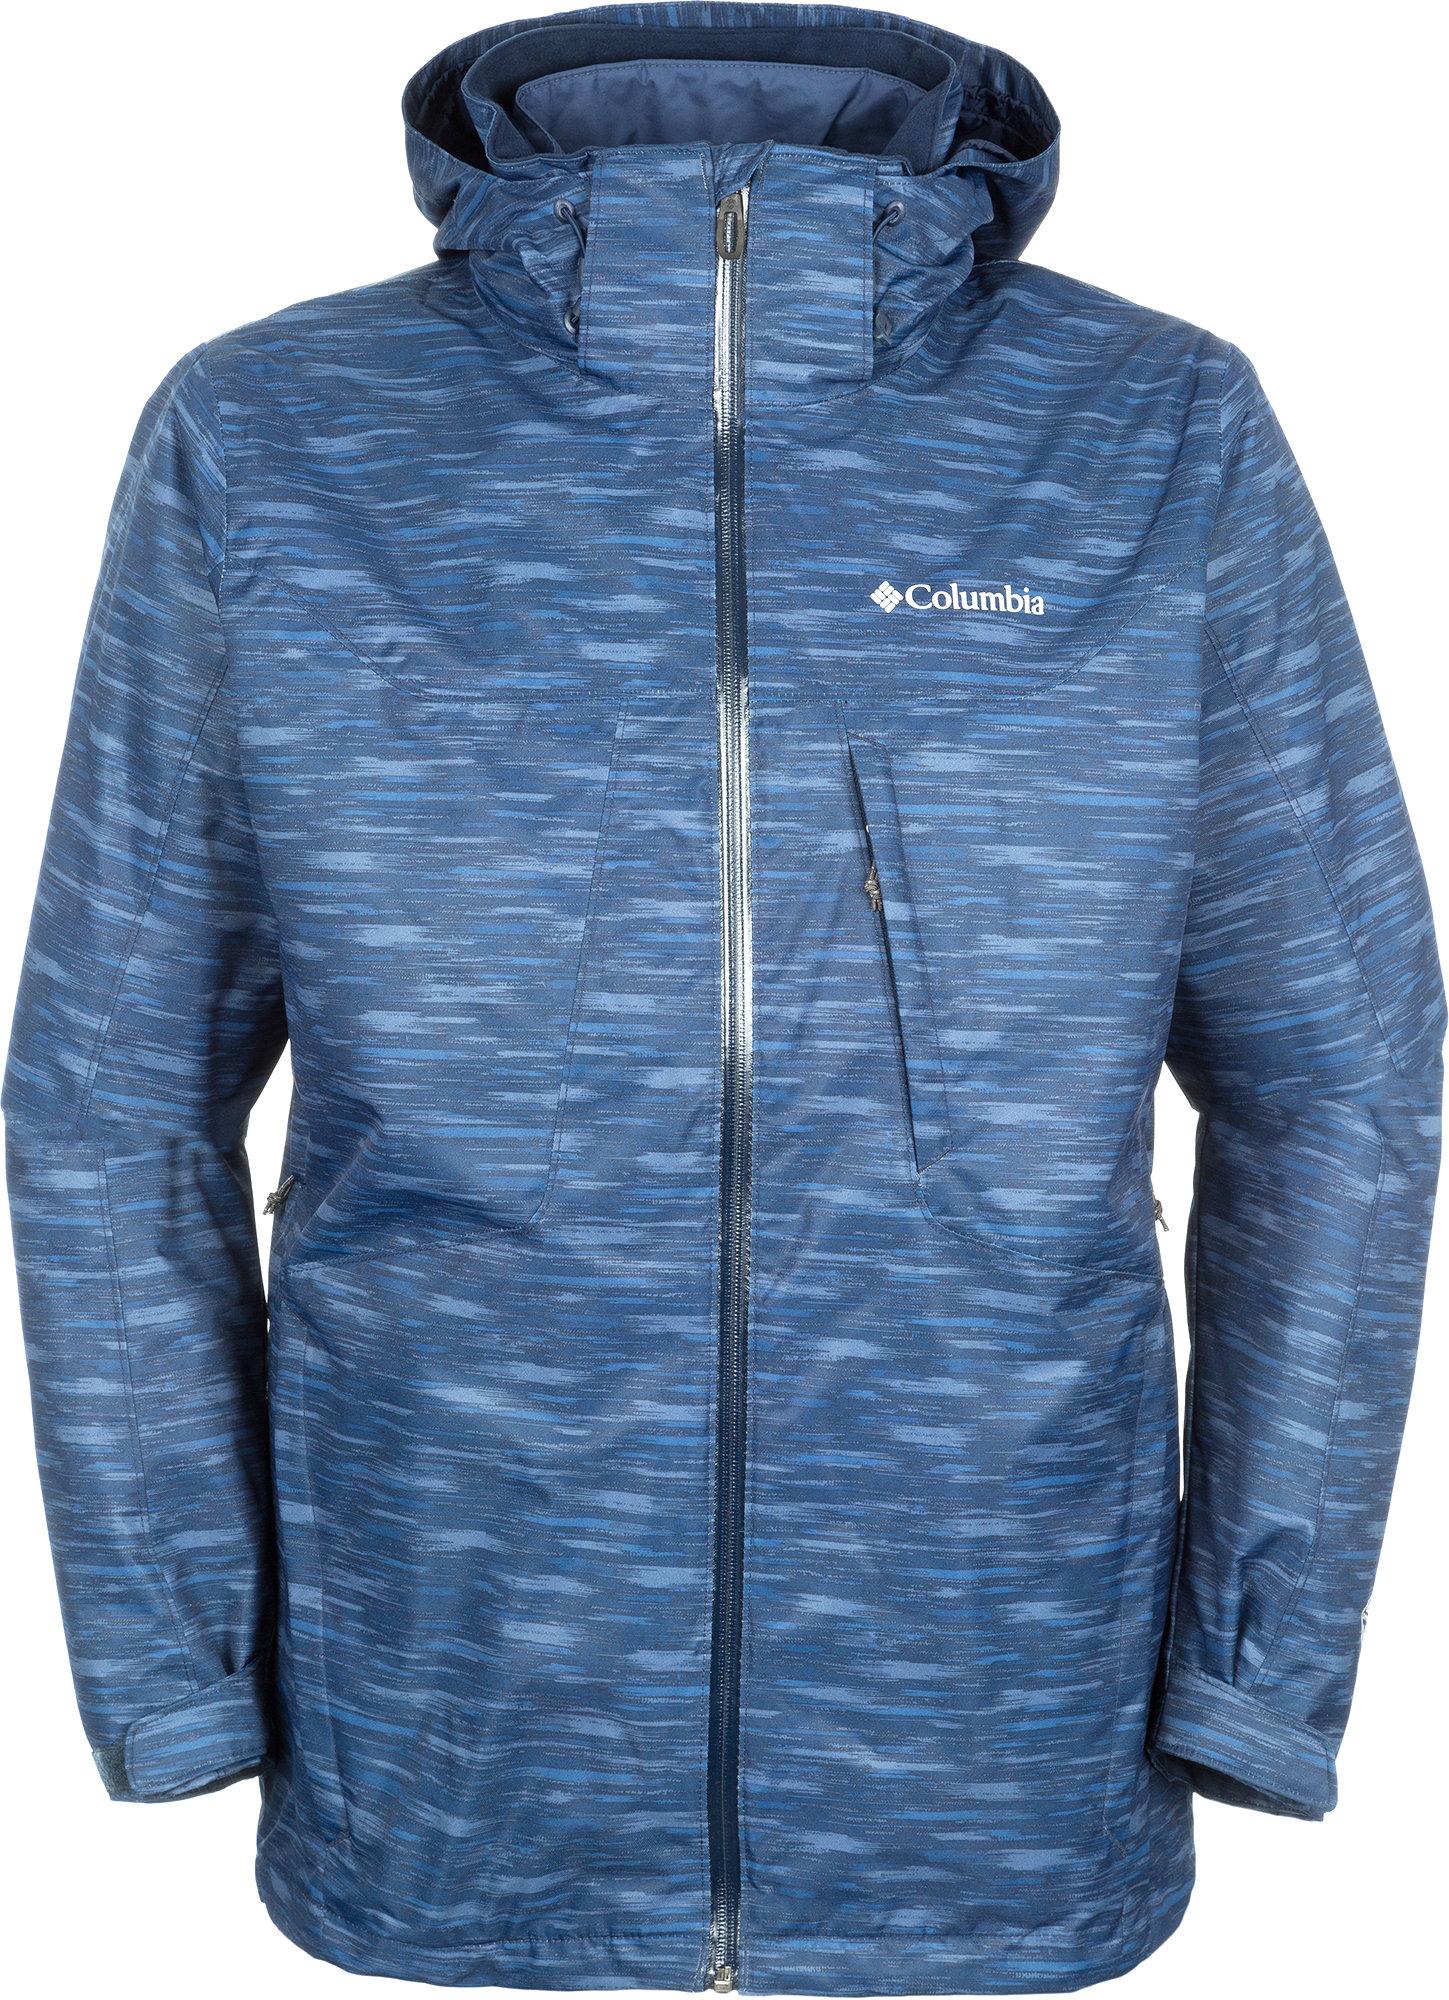 Куртка 3 в 1 мужская Columbia Whirlibird